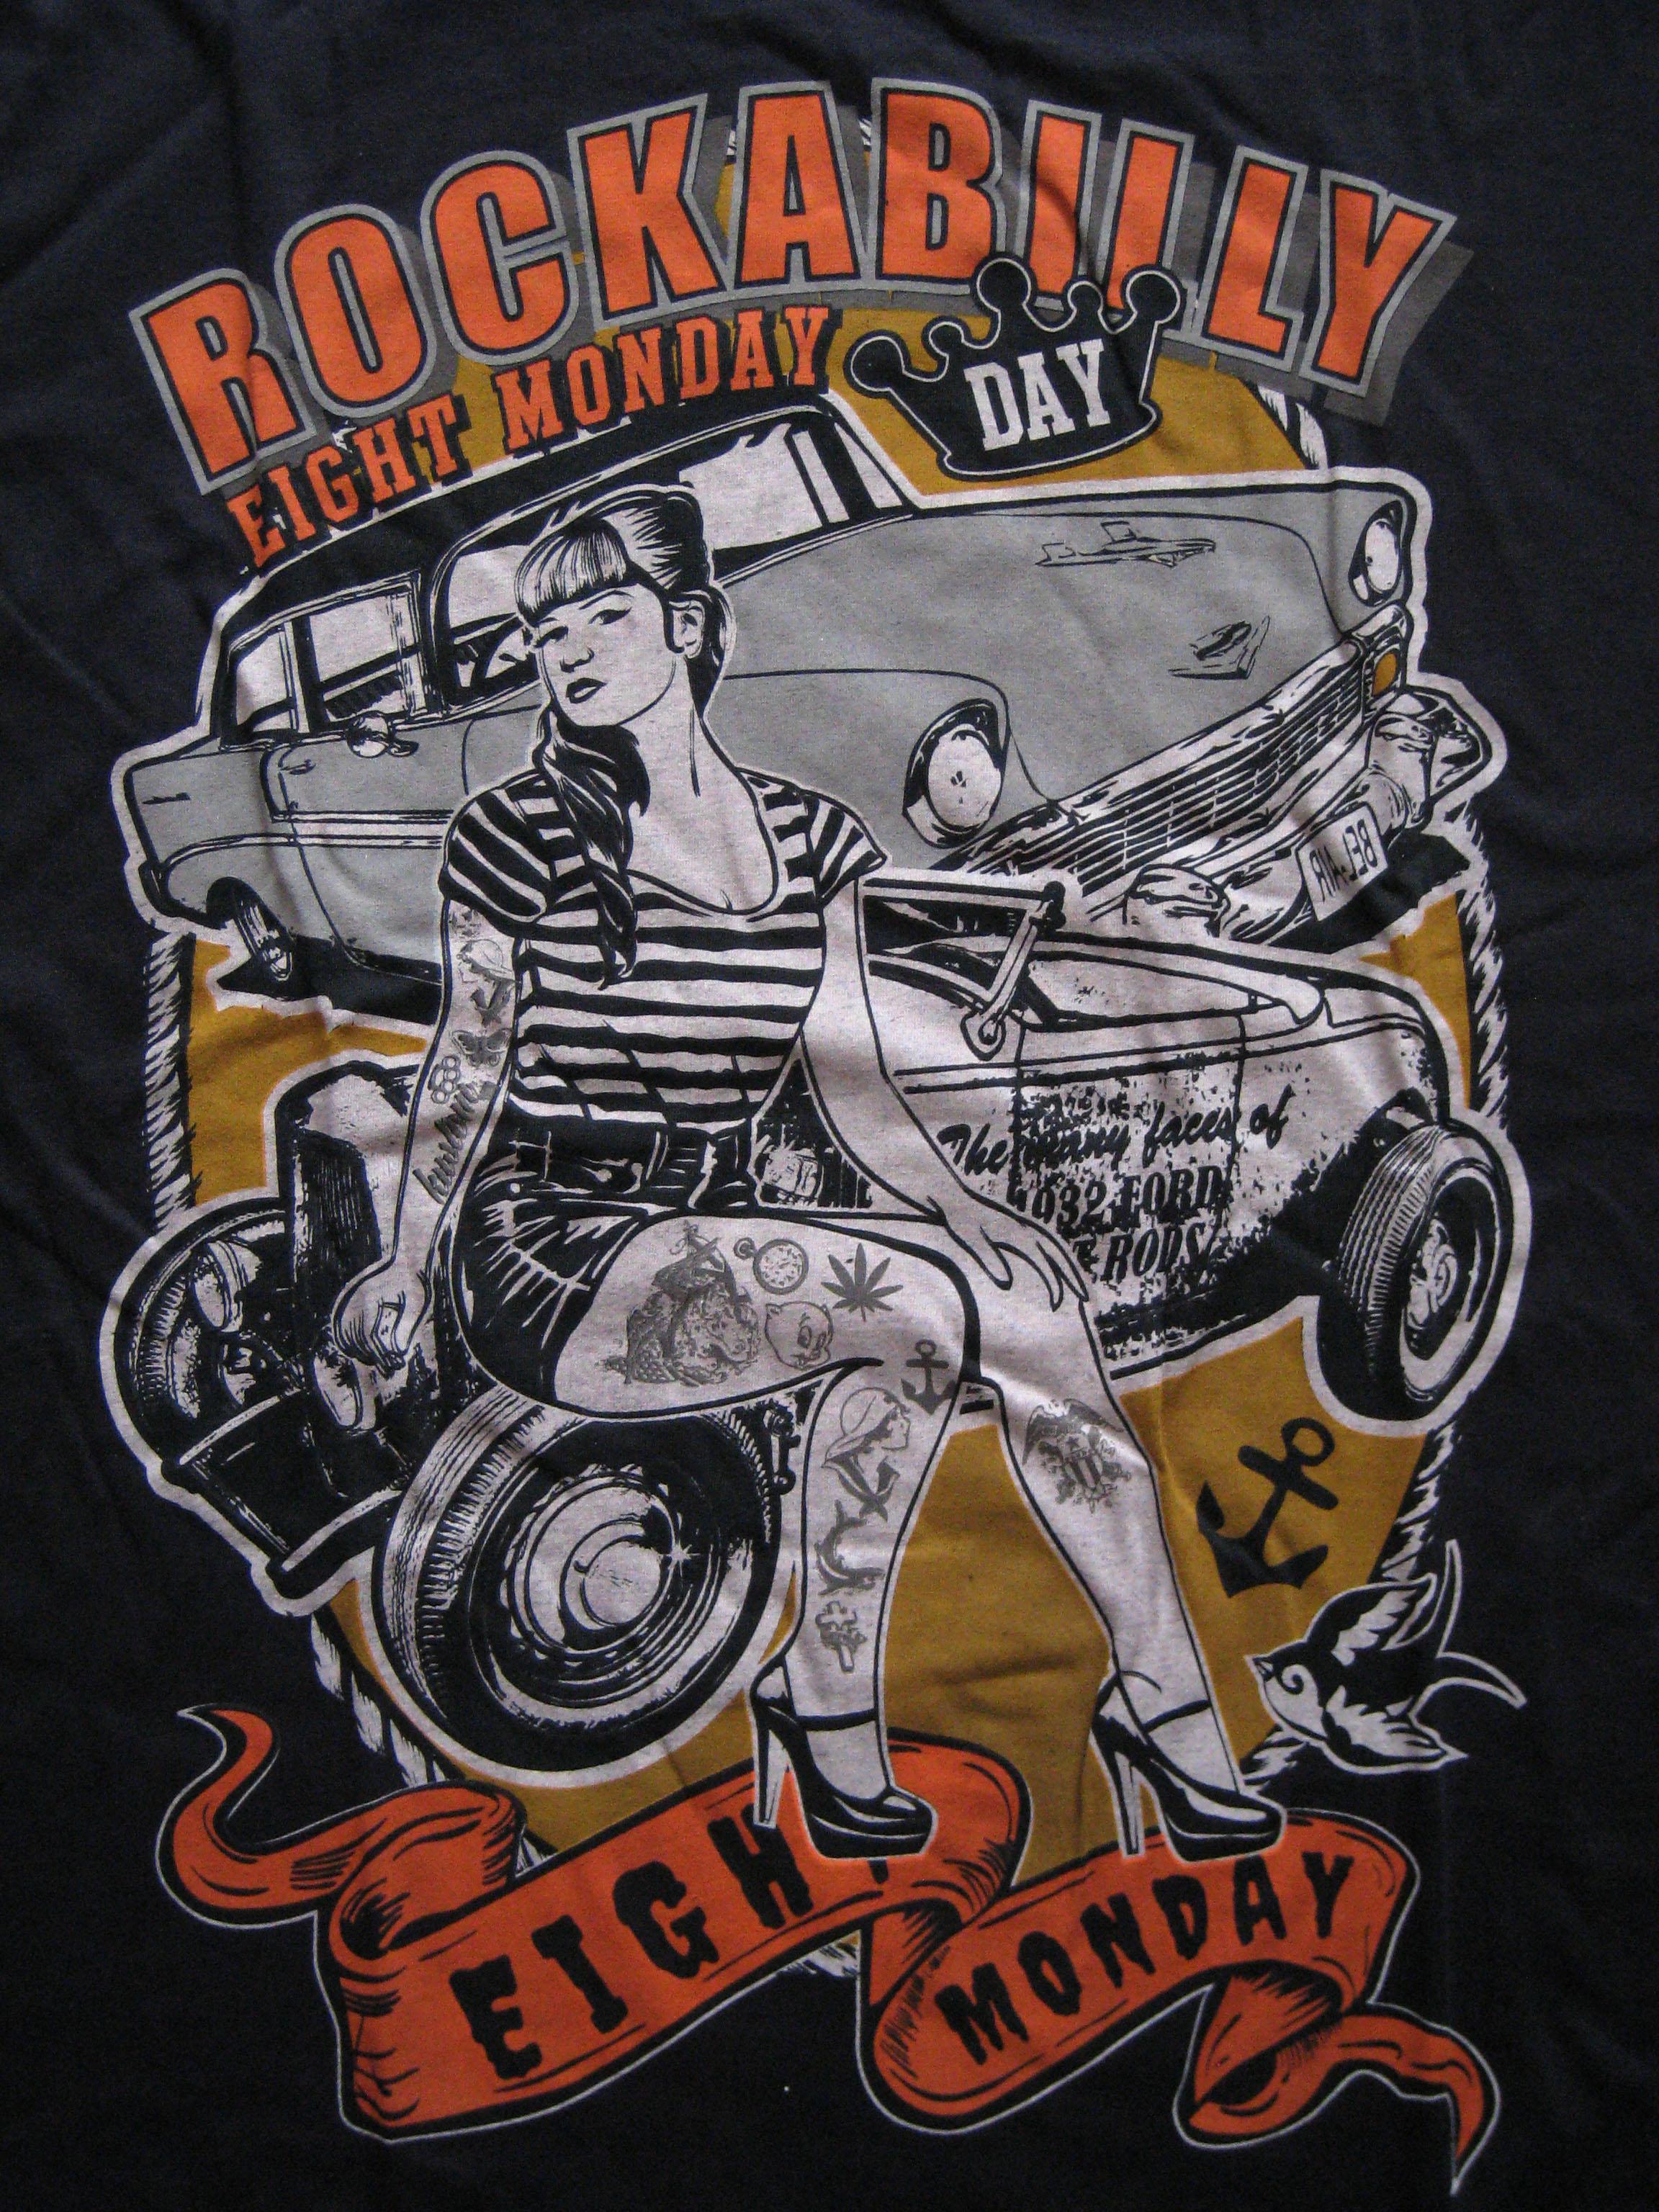 eight_monday_rockabilly_mens_t_shirt_pin_up_custom_cars_hot_rod_em26_t_shirts_4.jpg